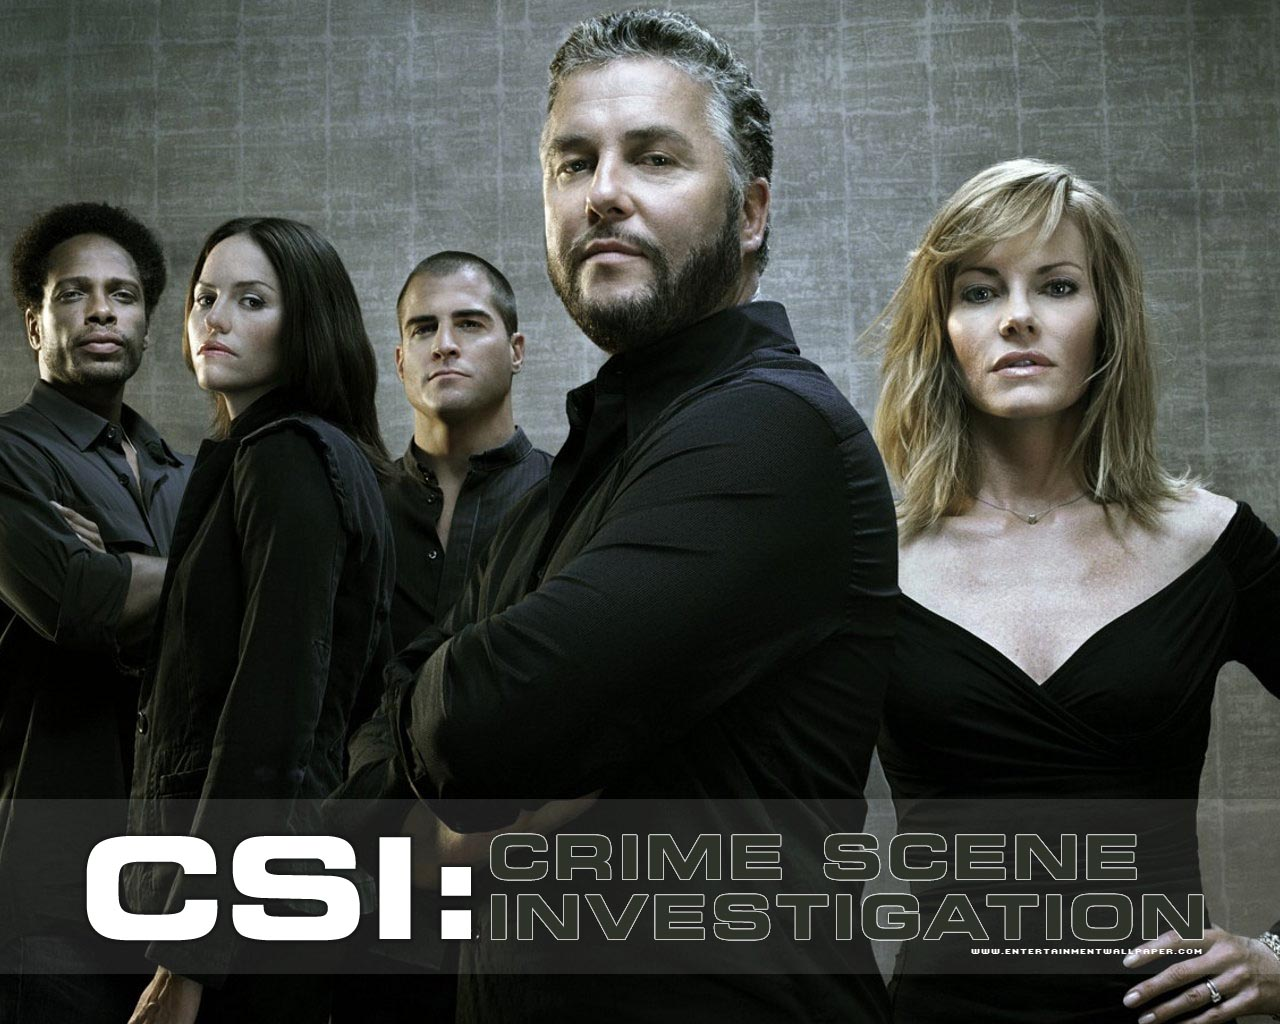 http://1.bp.blogspot.com/_-0VkDkRuv0s/TNiruuFOmDI/AAAAAAAAARA/FYBXSI7uDBc/s1600/CSI+LAS+VEGAS.jpg